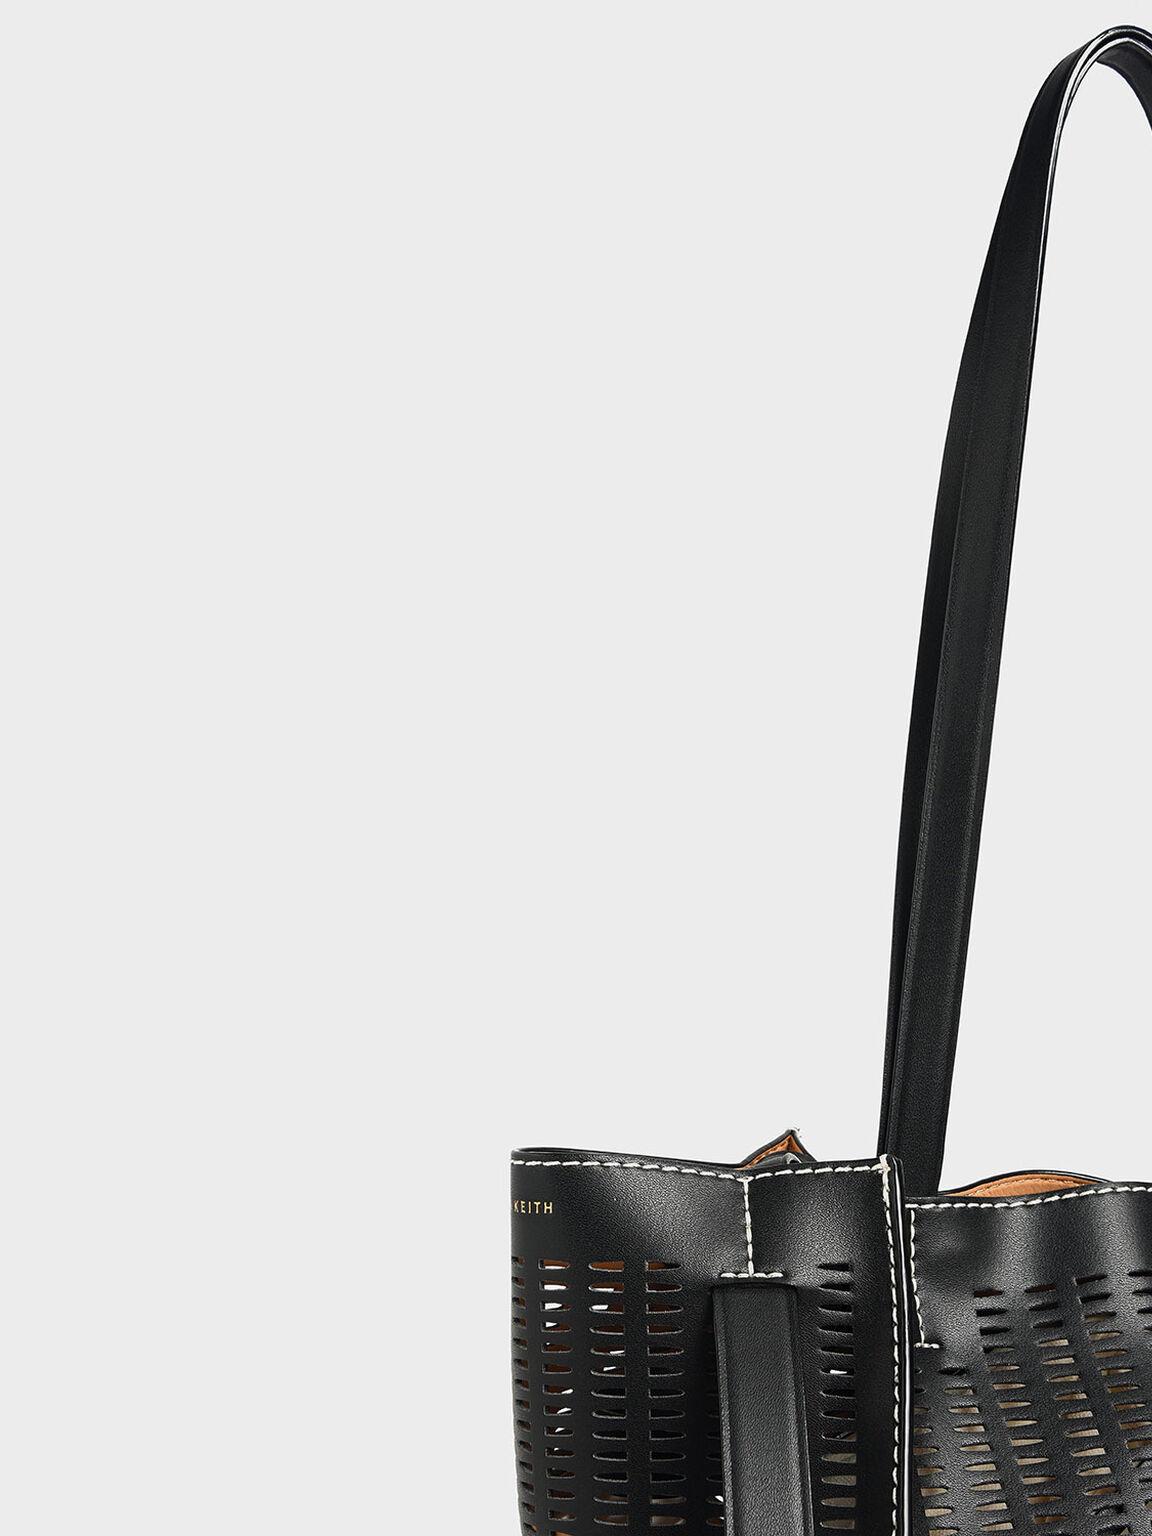 Large Laser-Cut Tote Bag, Black, hi-res